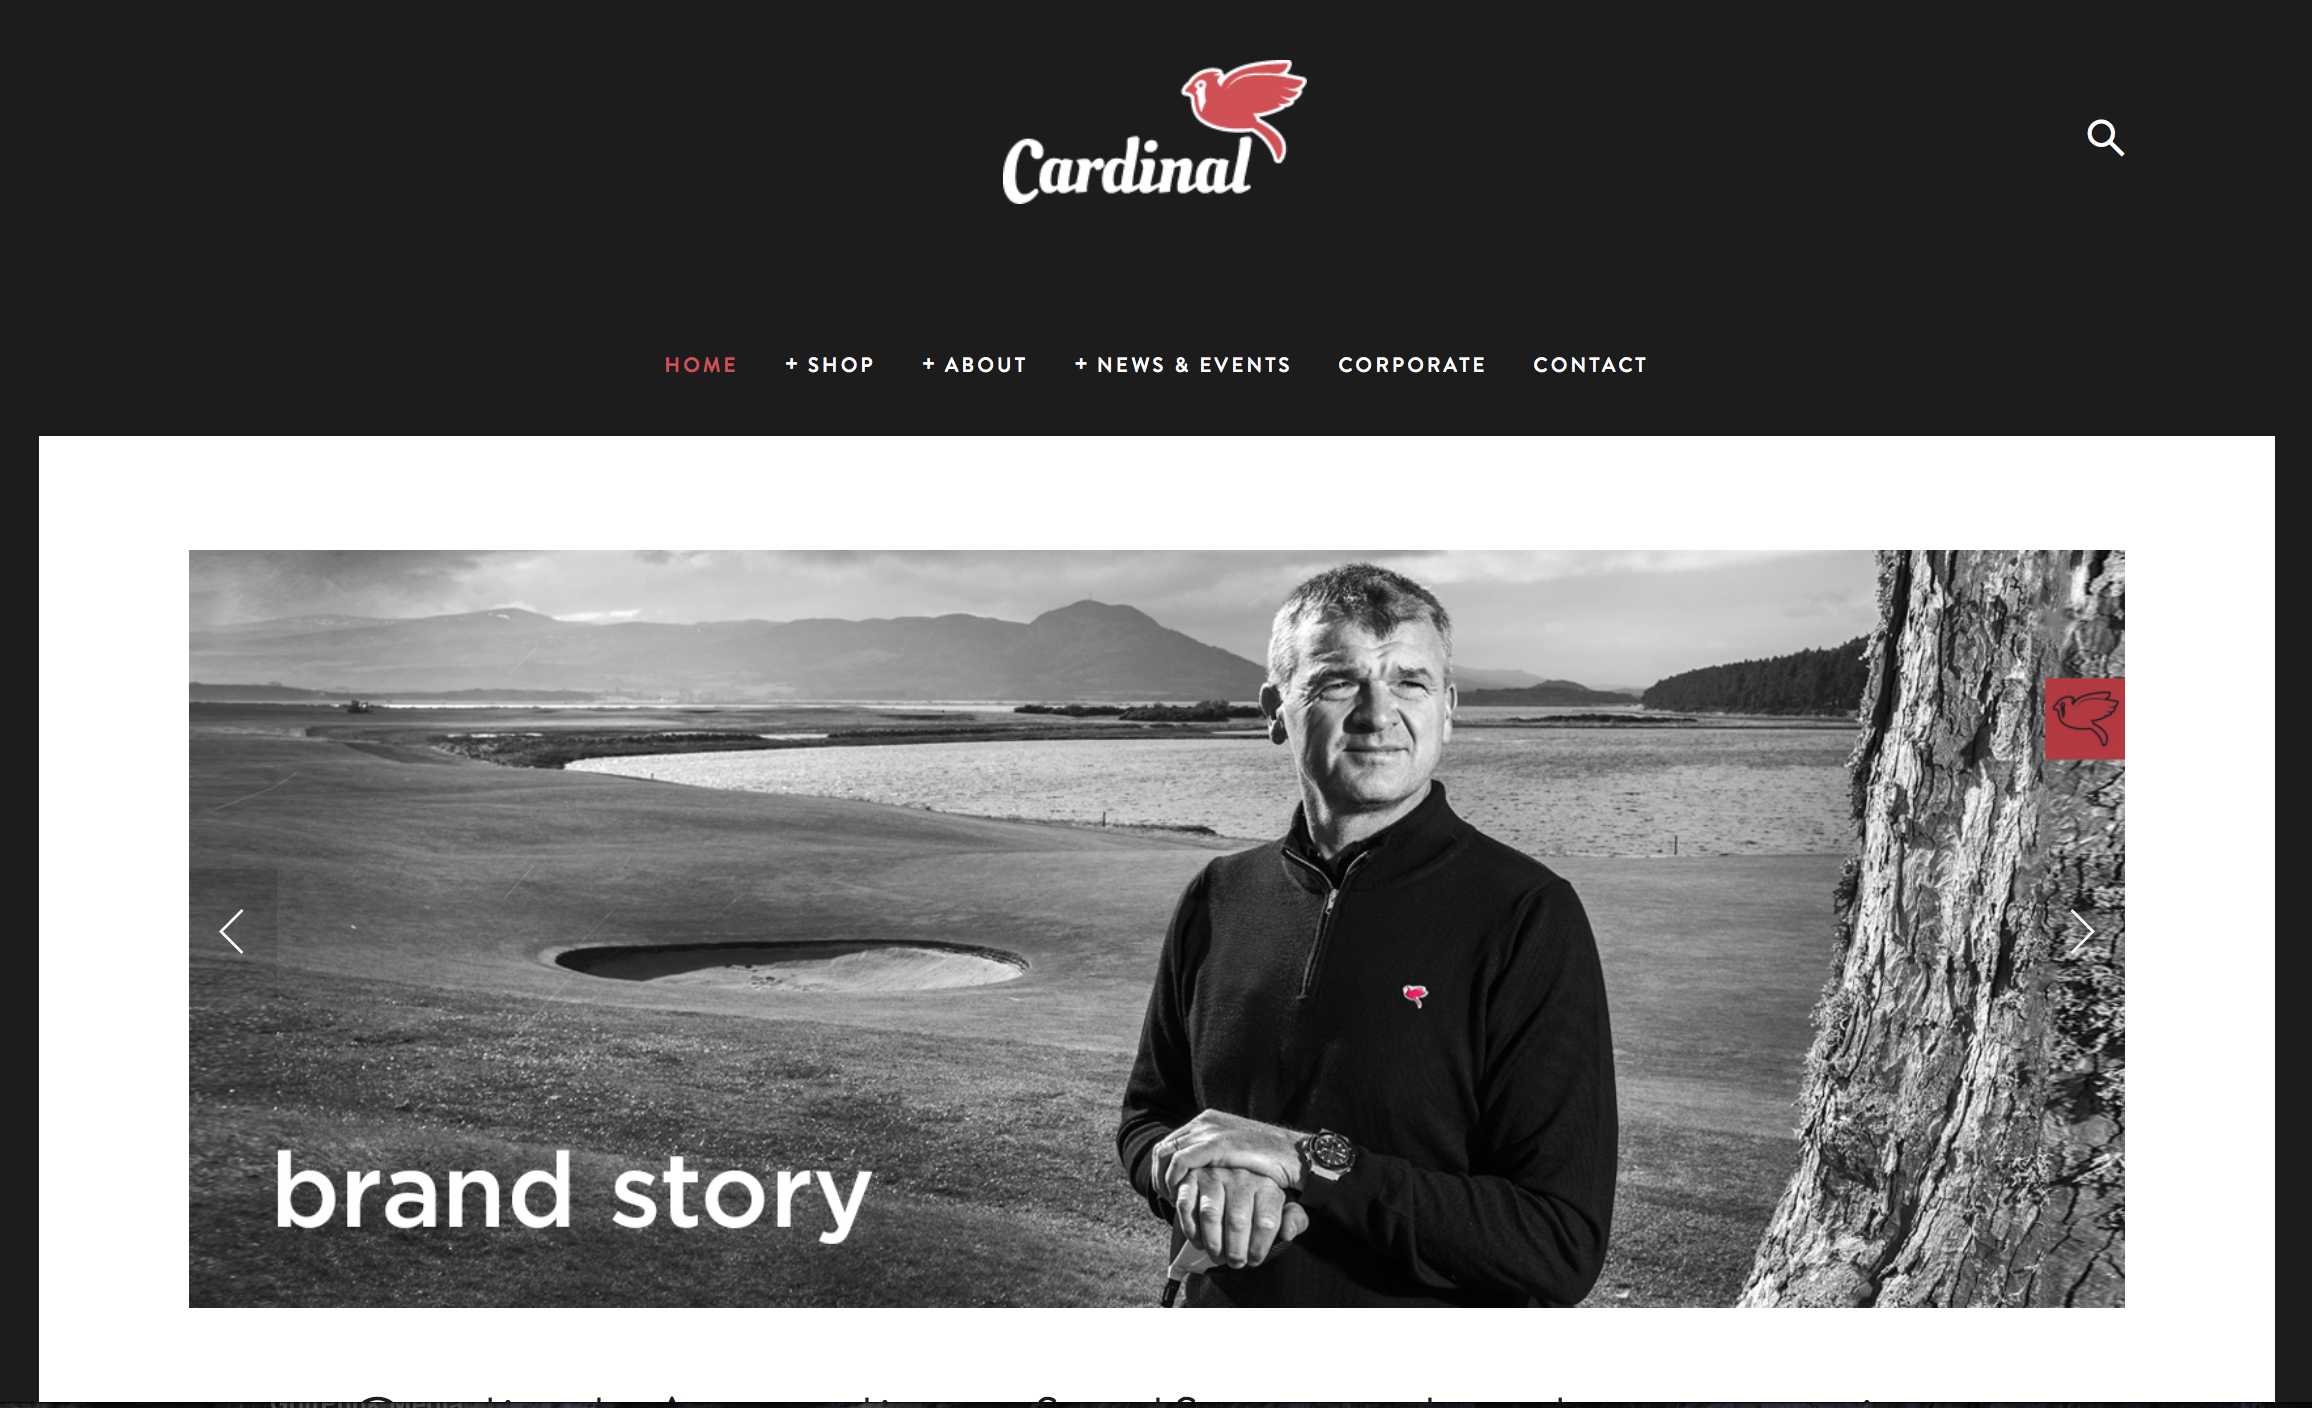 Paul Lawrie's Cardinal range